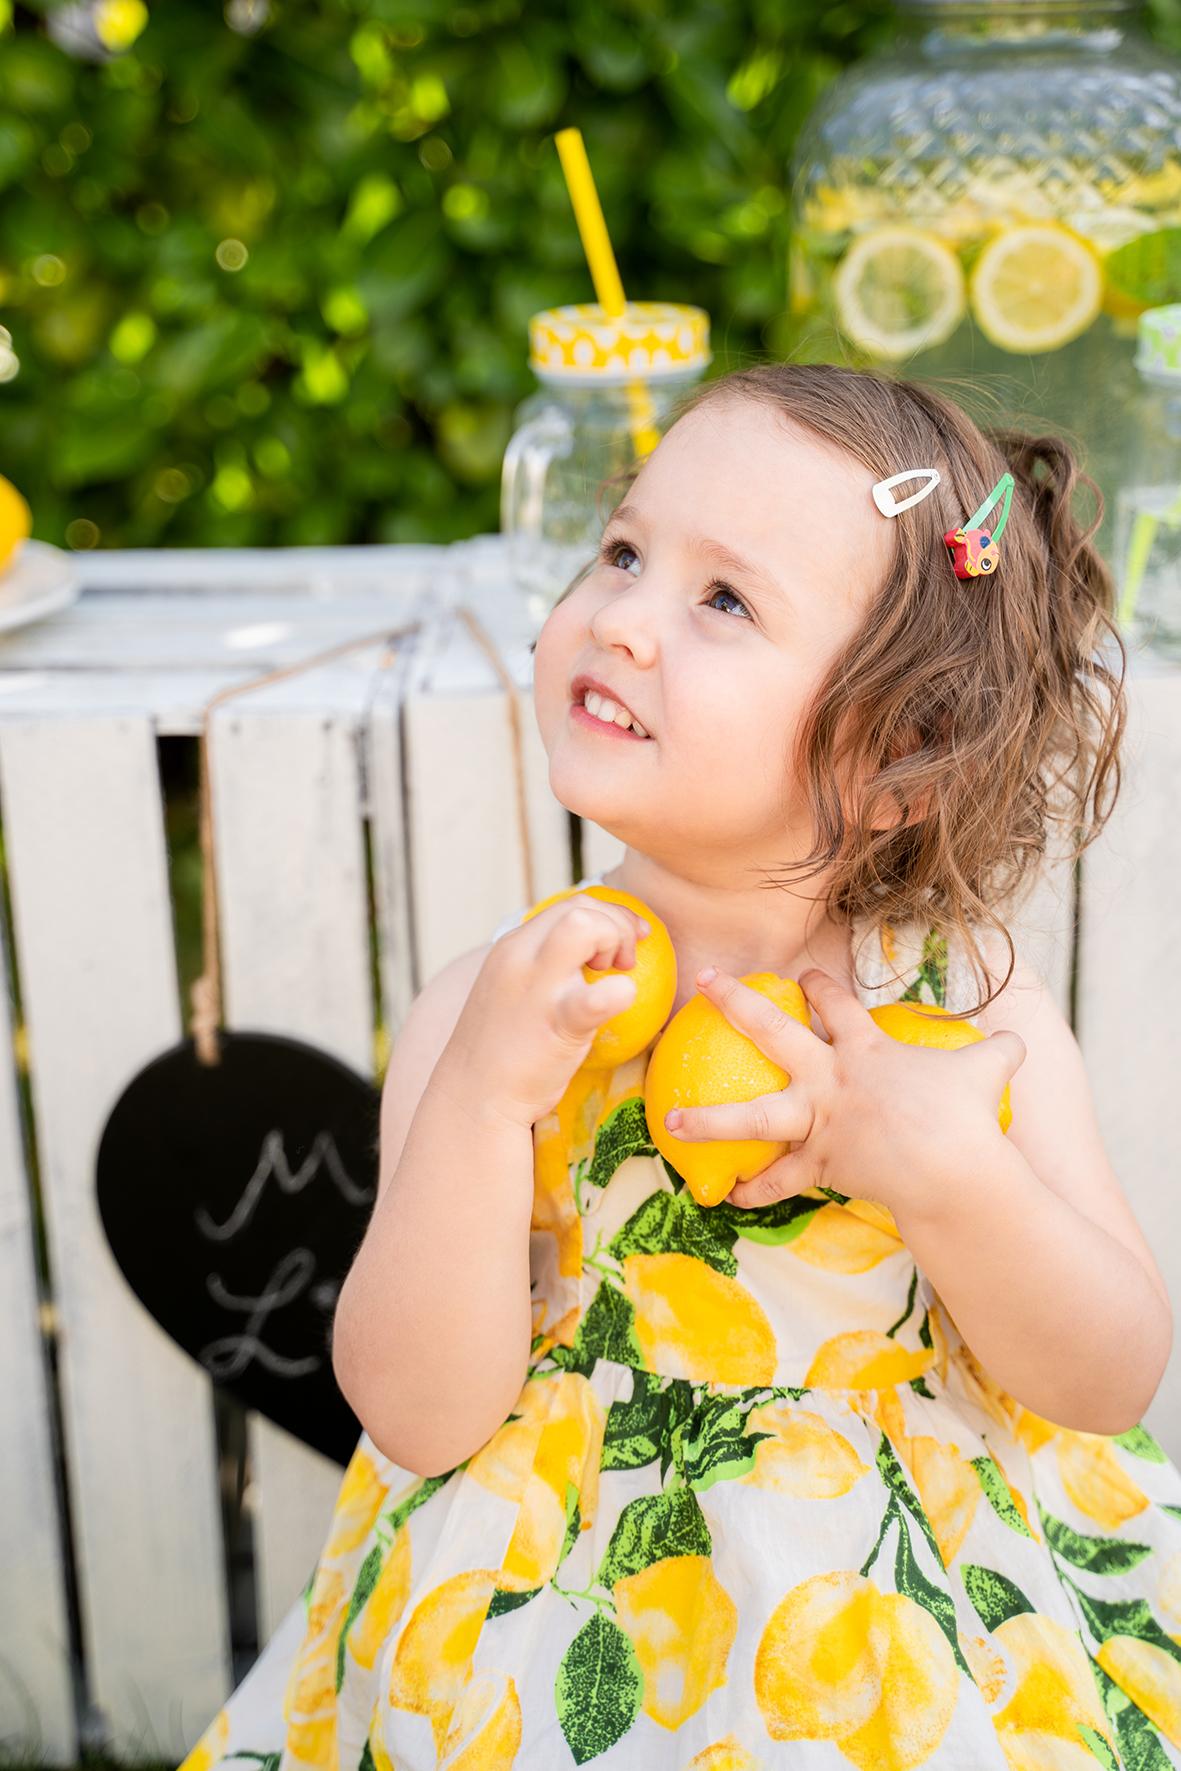 Zitronensammlerin Fotoshooting Limonade Bremen Fotostudio Lilienthal Osterholz Scharmbeck